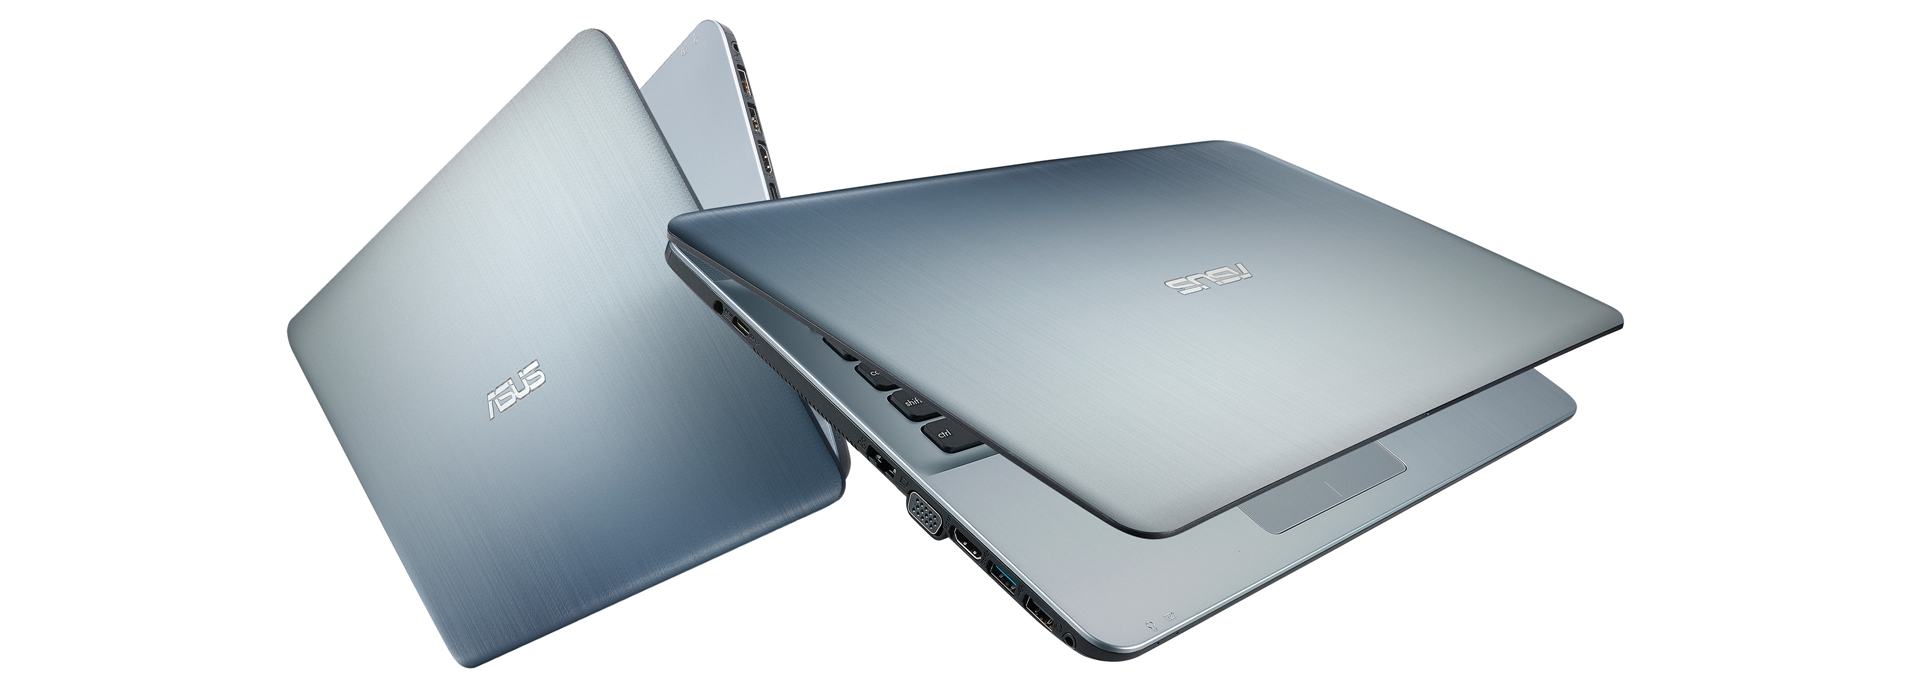 Asus X441UB (Asus.com)